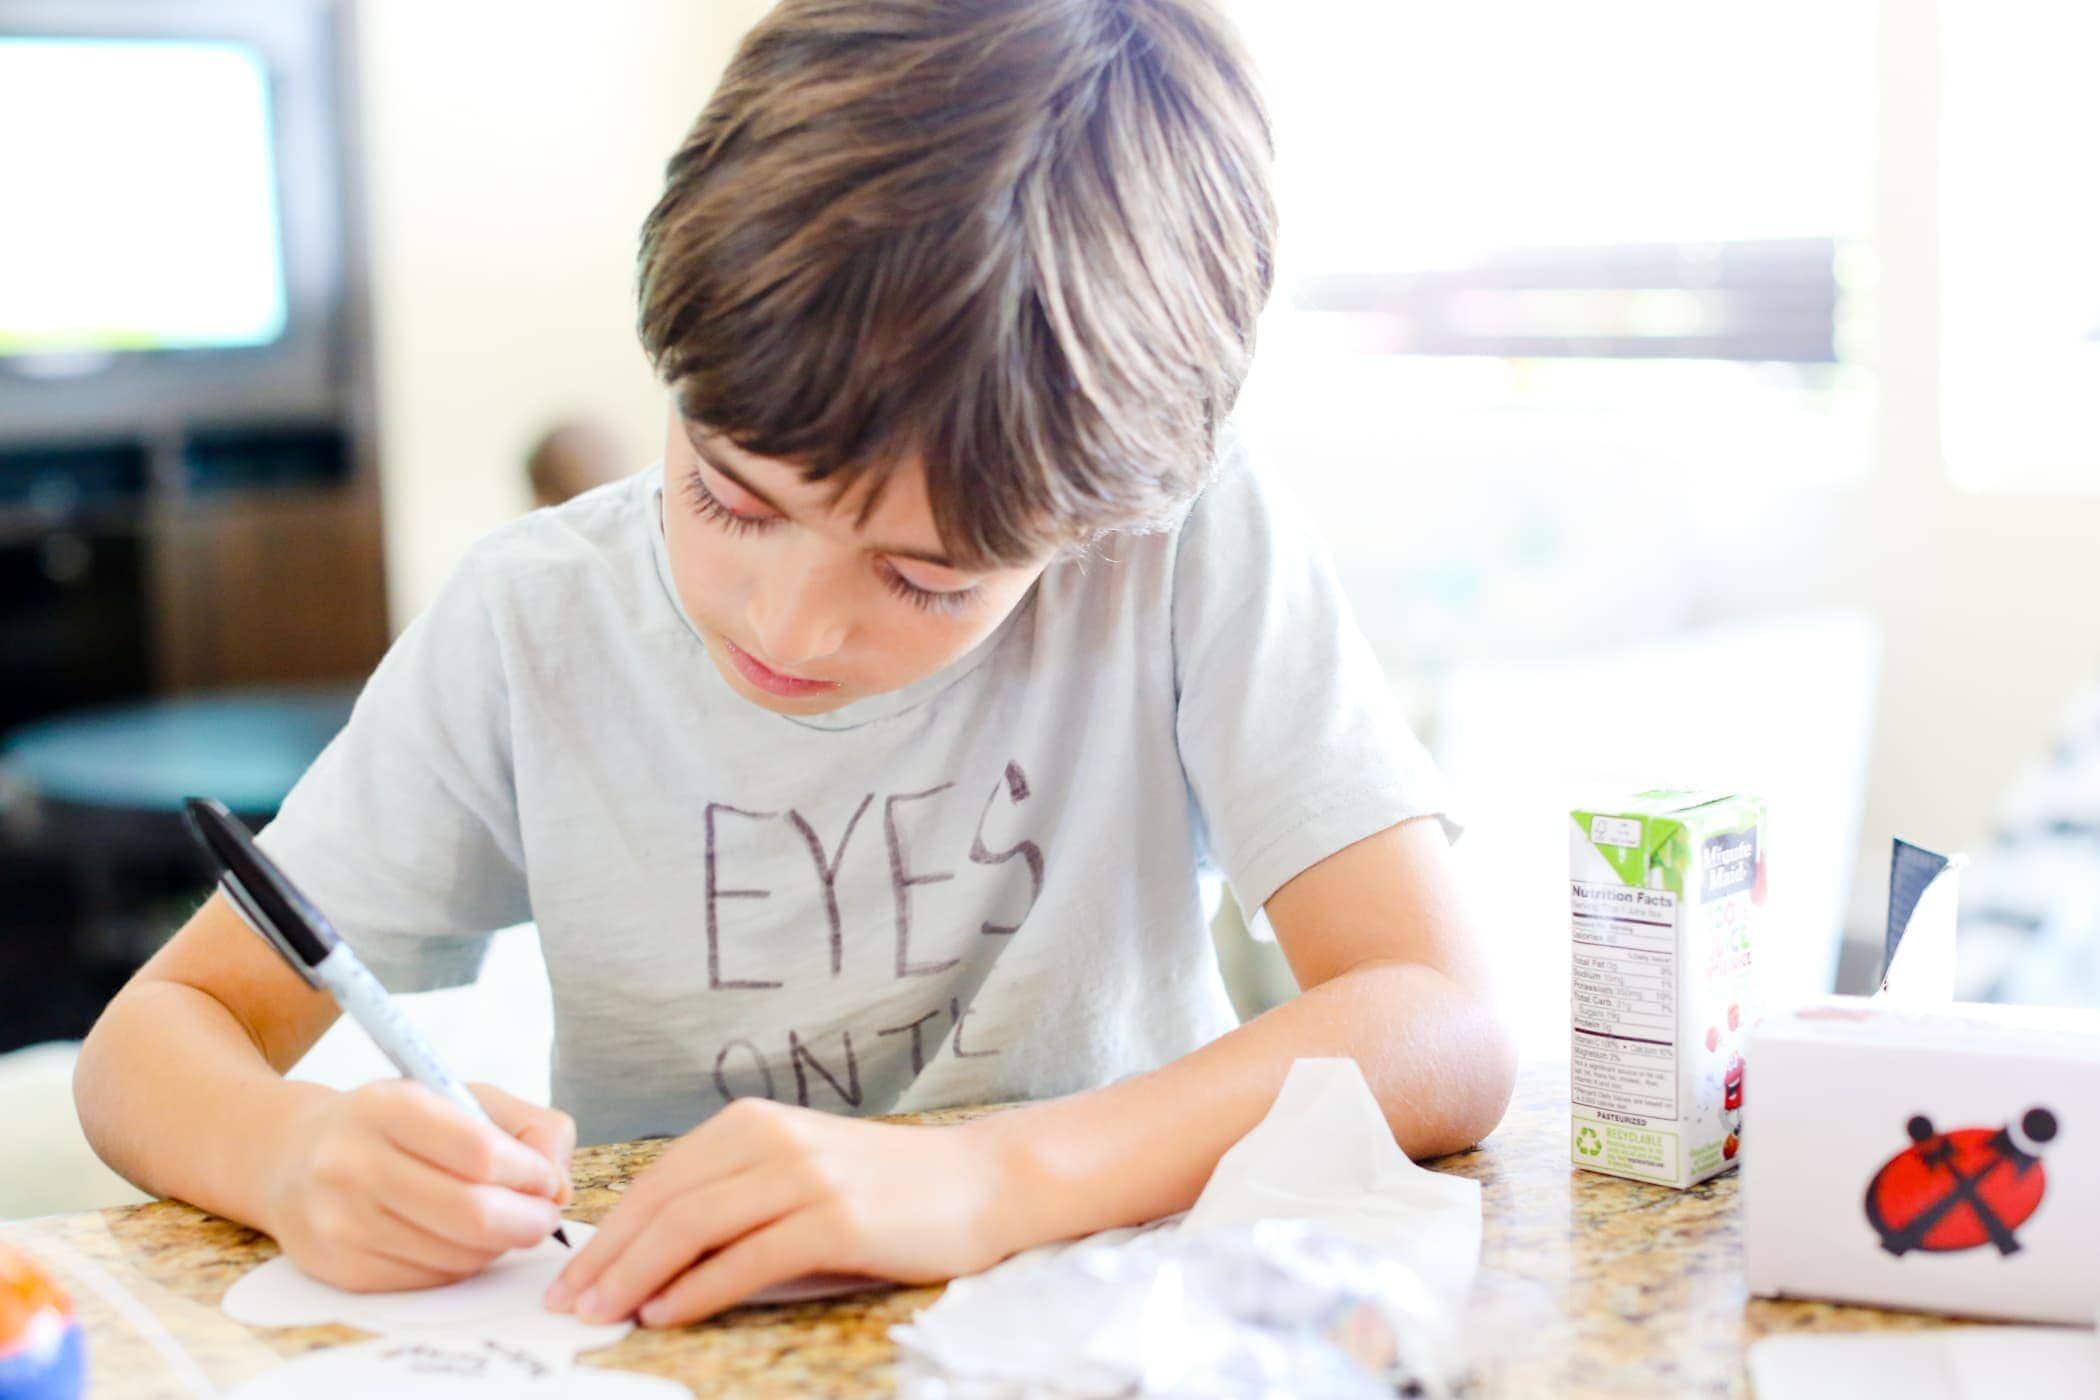 boy doing crafts